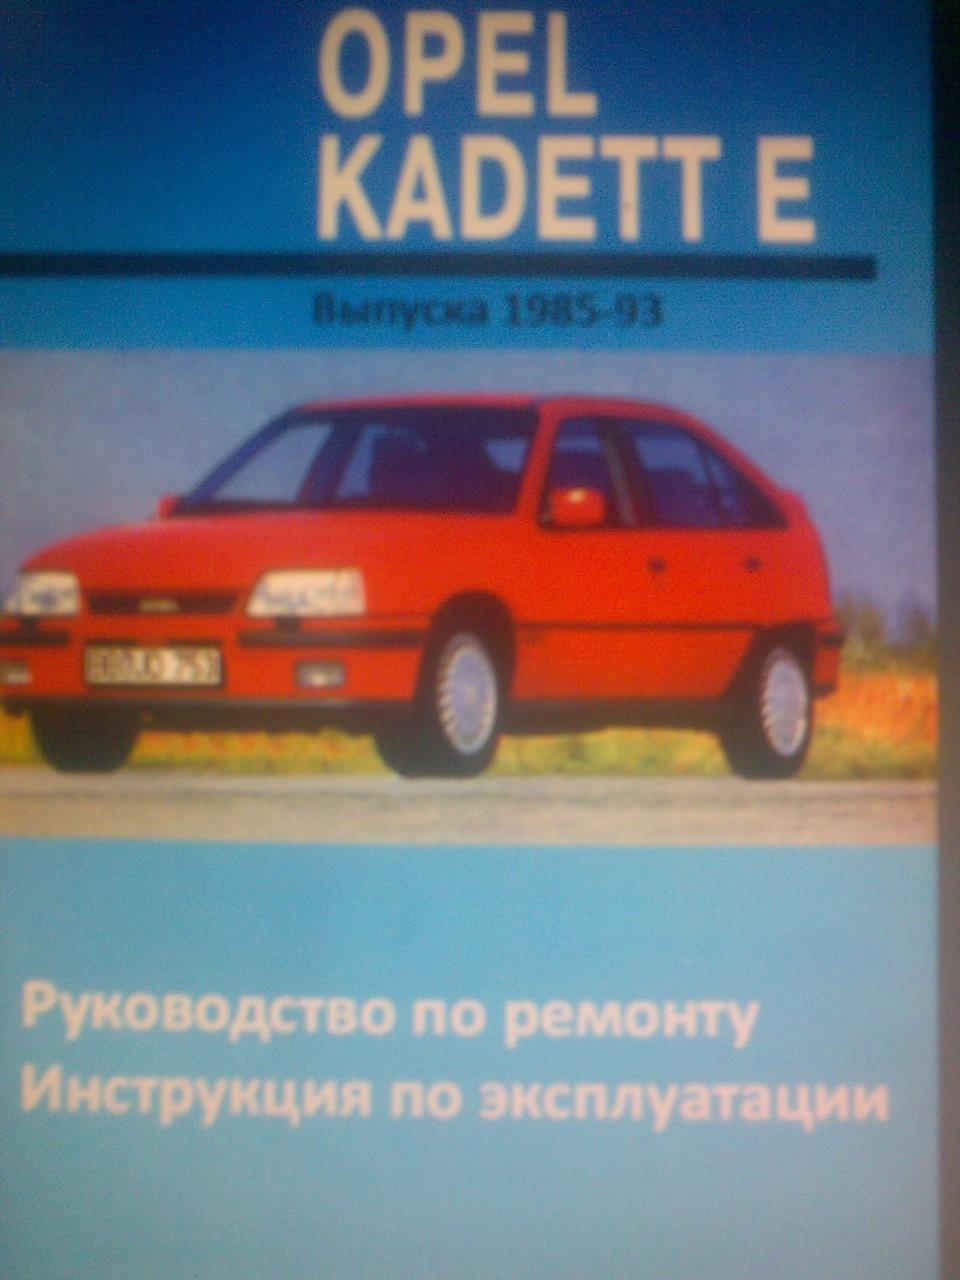 книги по ремонту и эксплуатации автомобилей онлайн